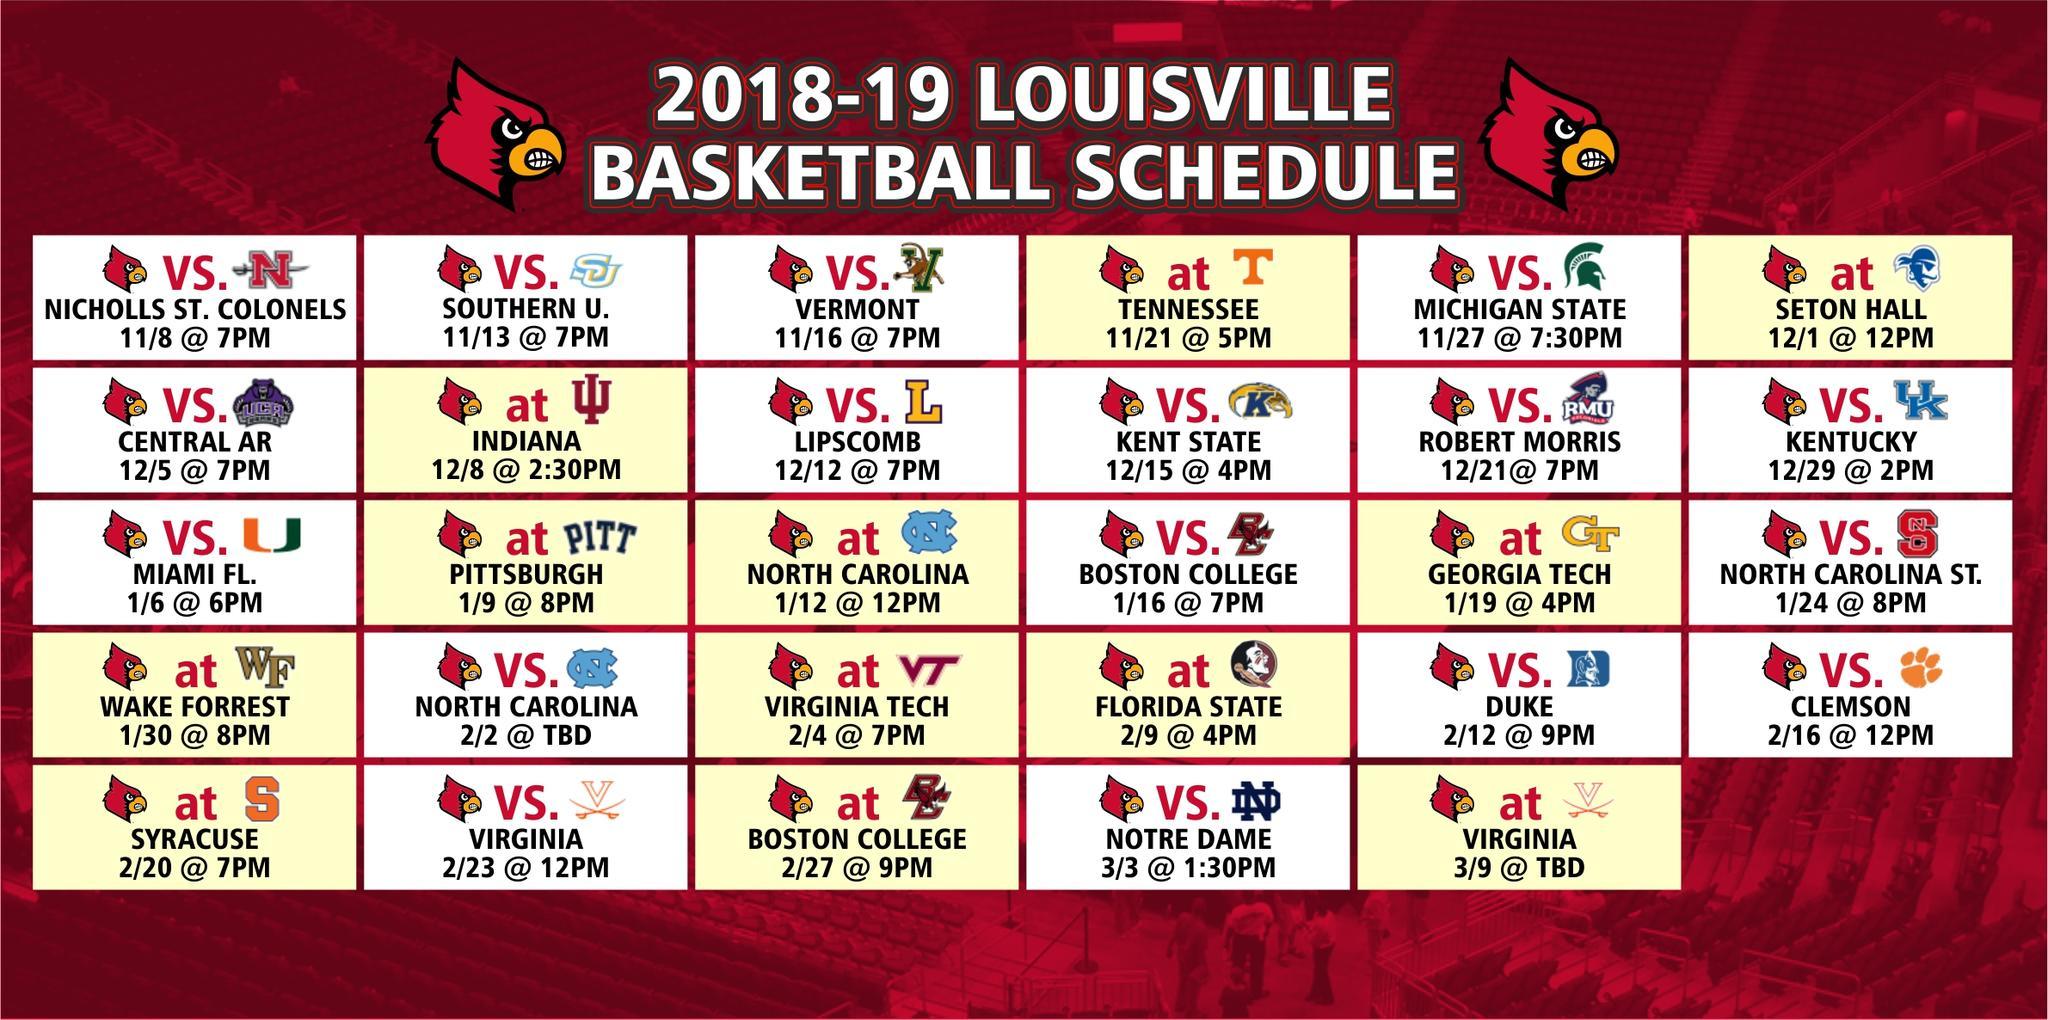 basketball schedule - jd becker's uk & uofl superstore